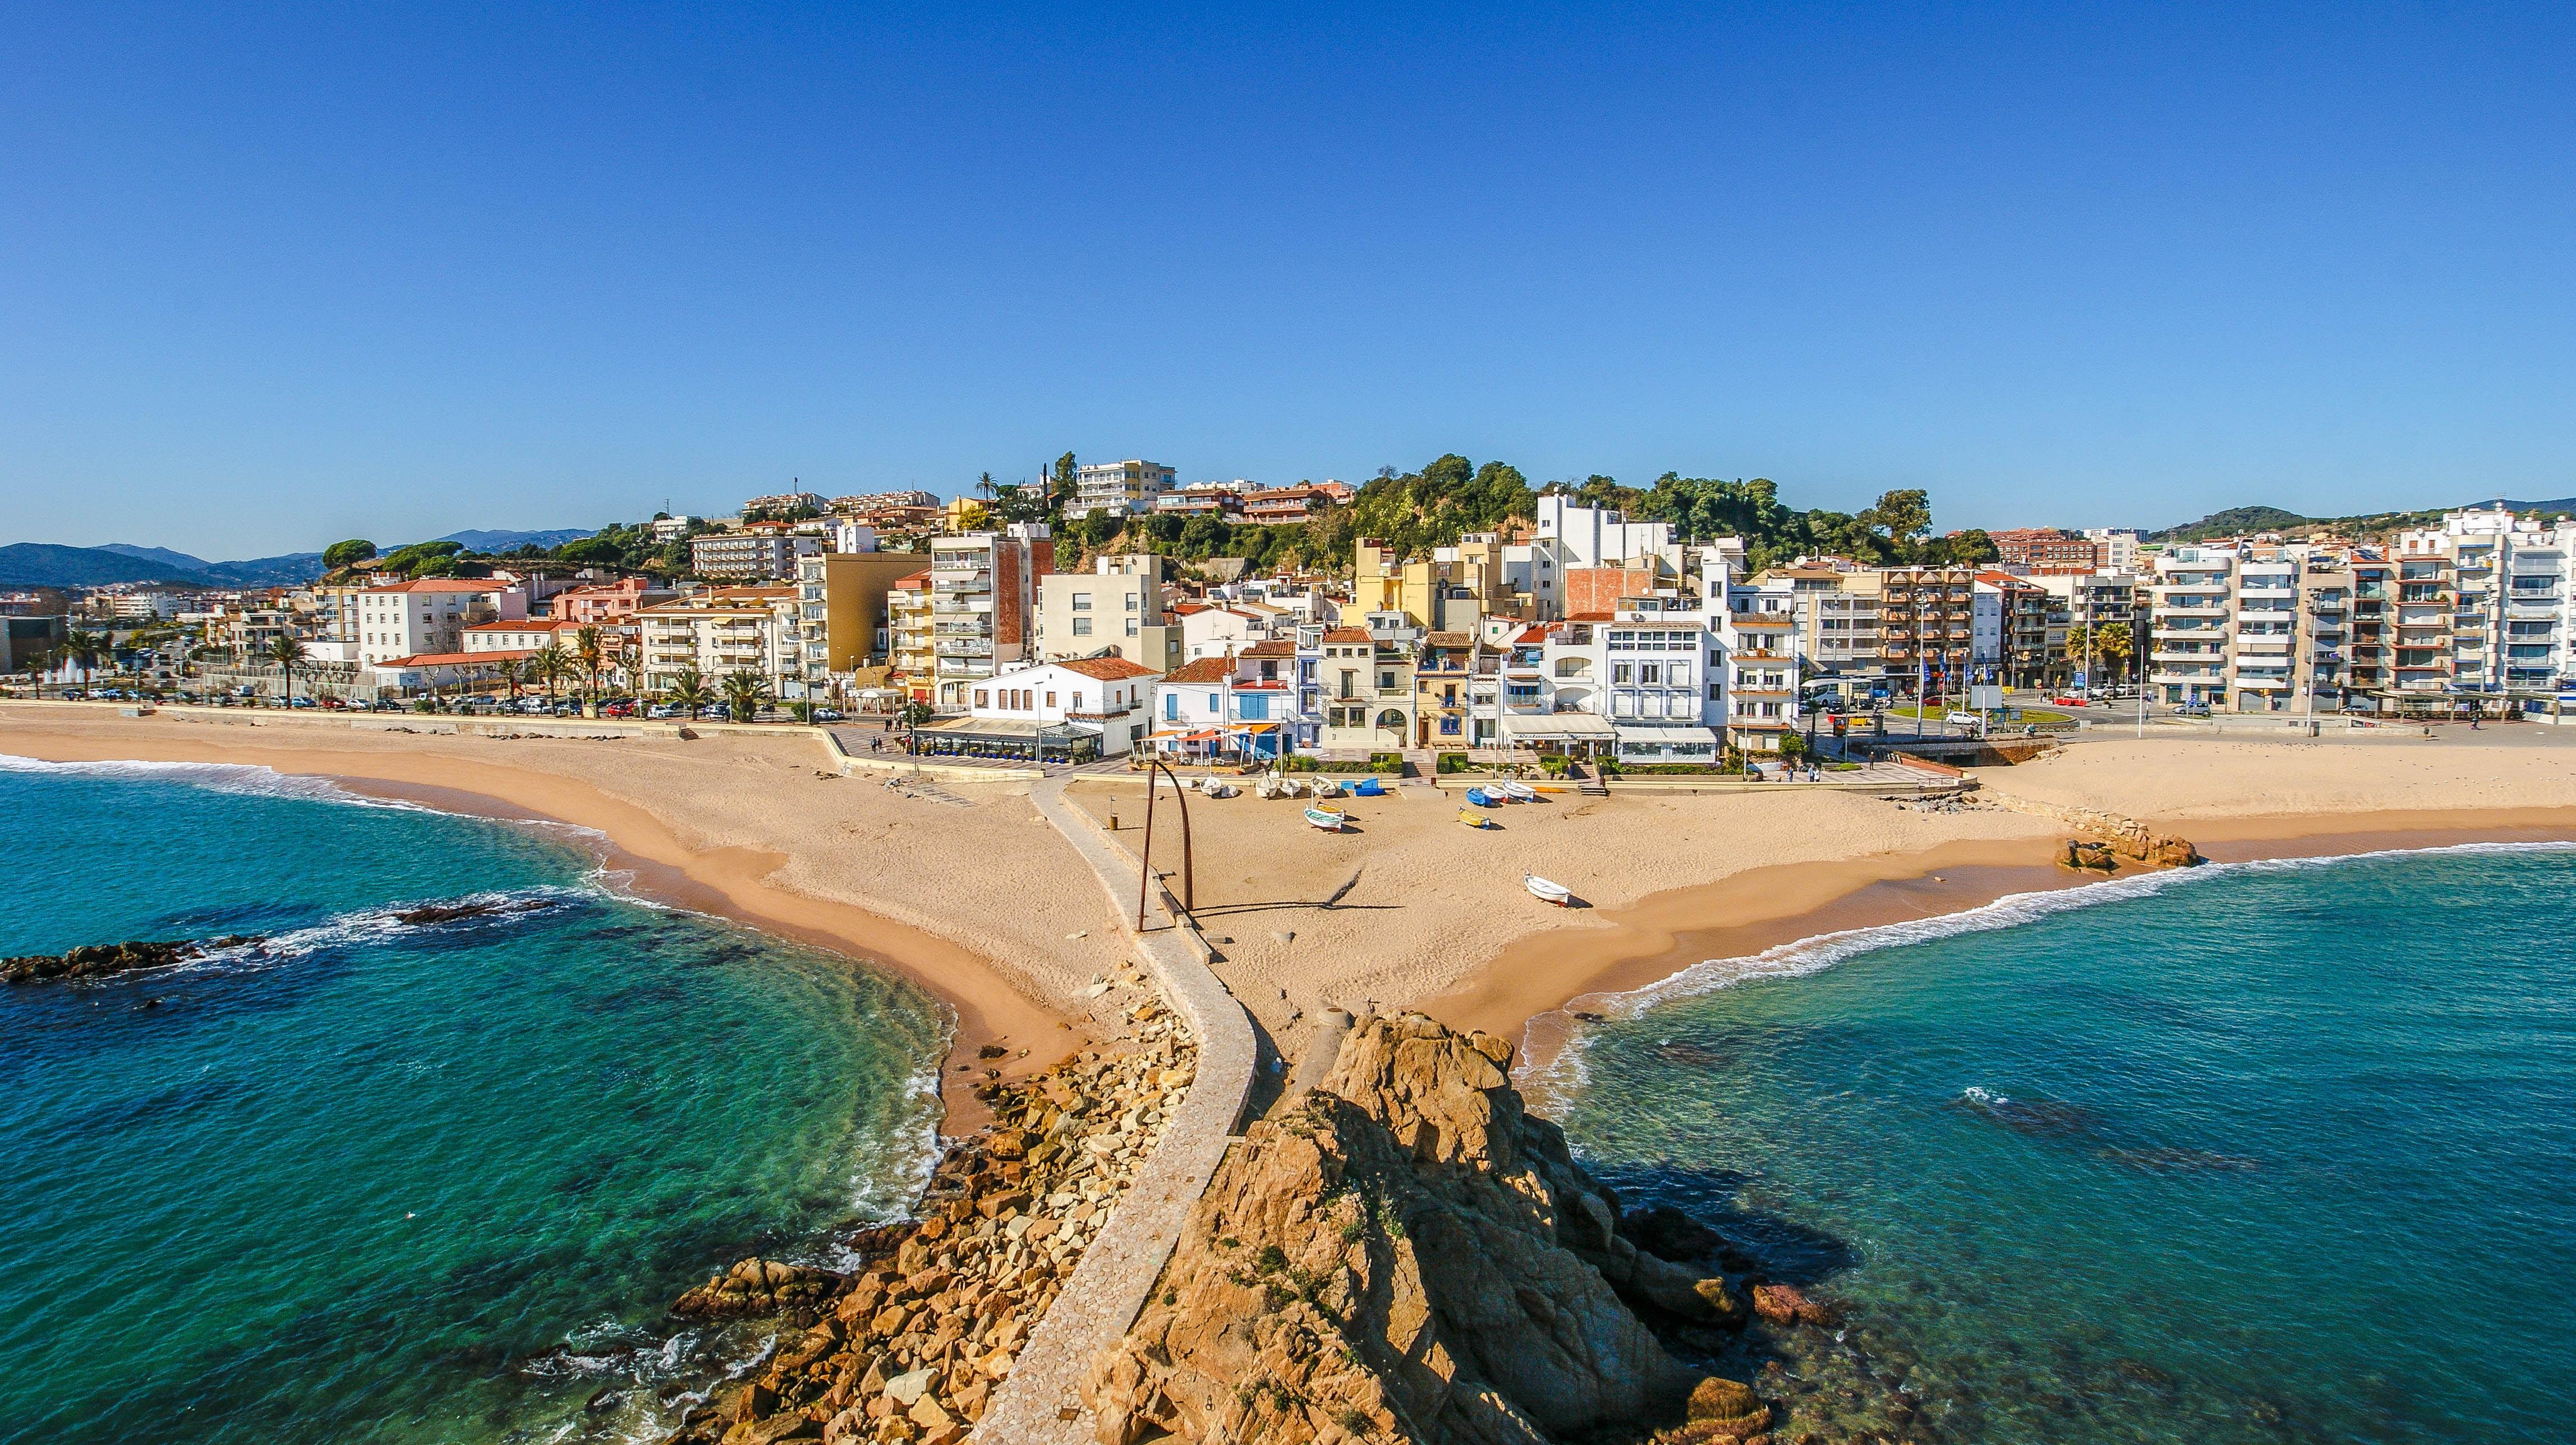 Sa Palomera town on the sand beach shoreline